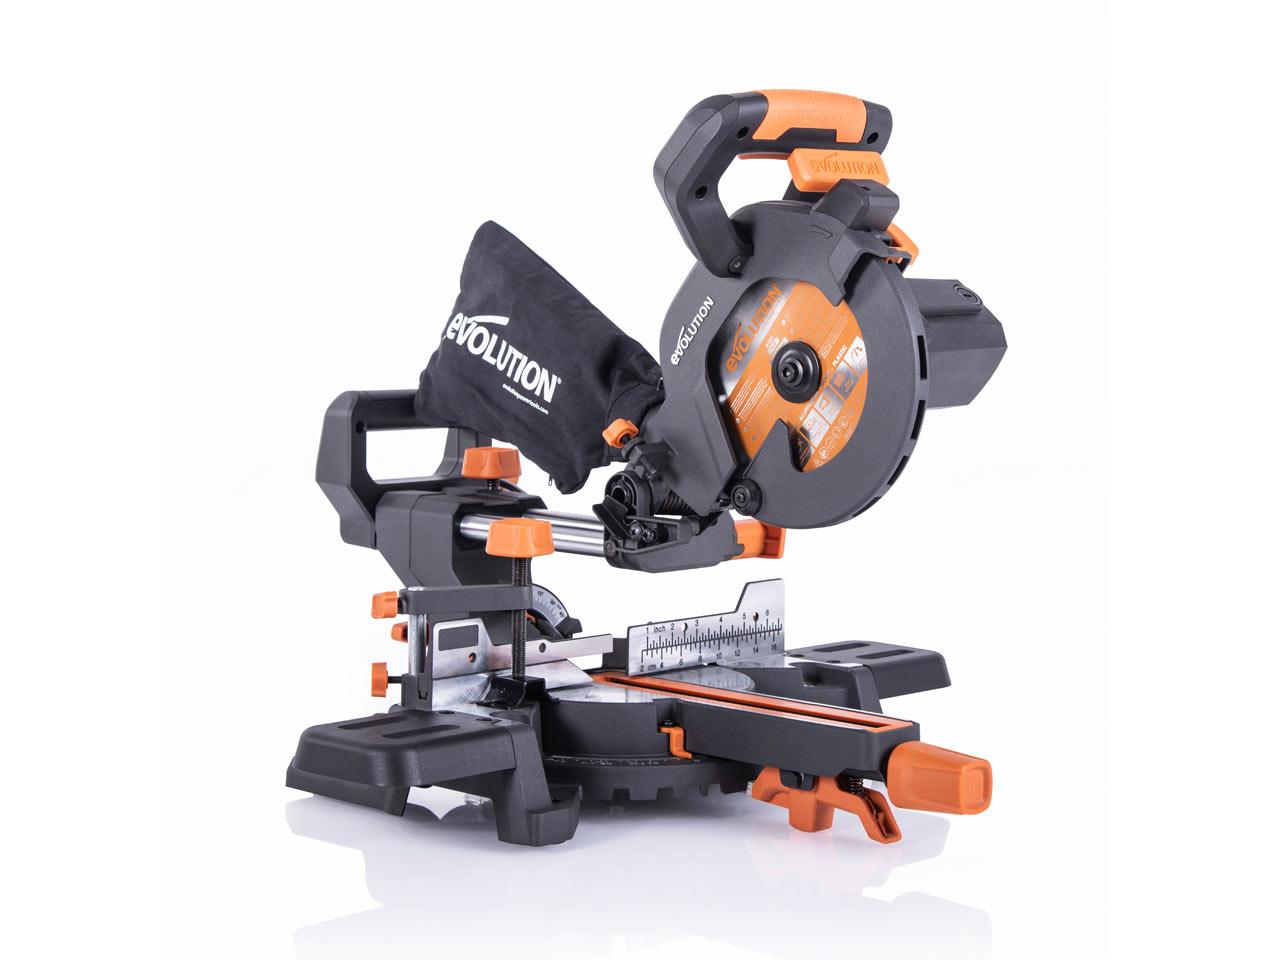 Evolution R185SMS+ 185mm Multi-Material Sliding Mitre Saw £119 @ FFX ebay